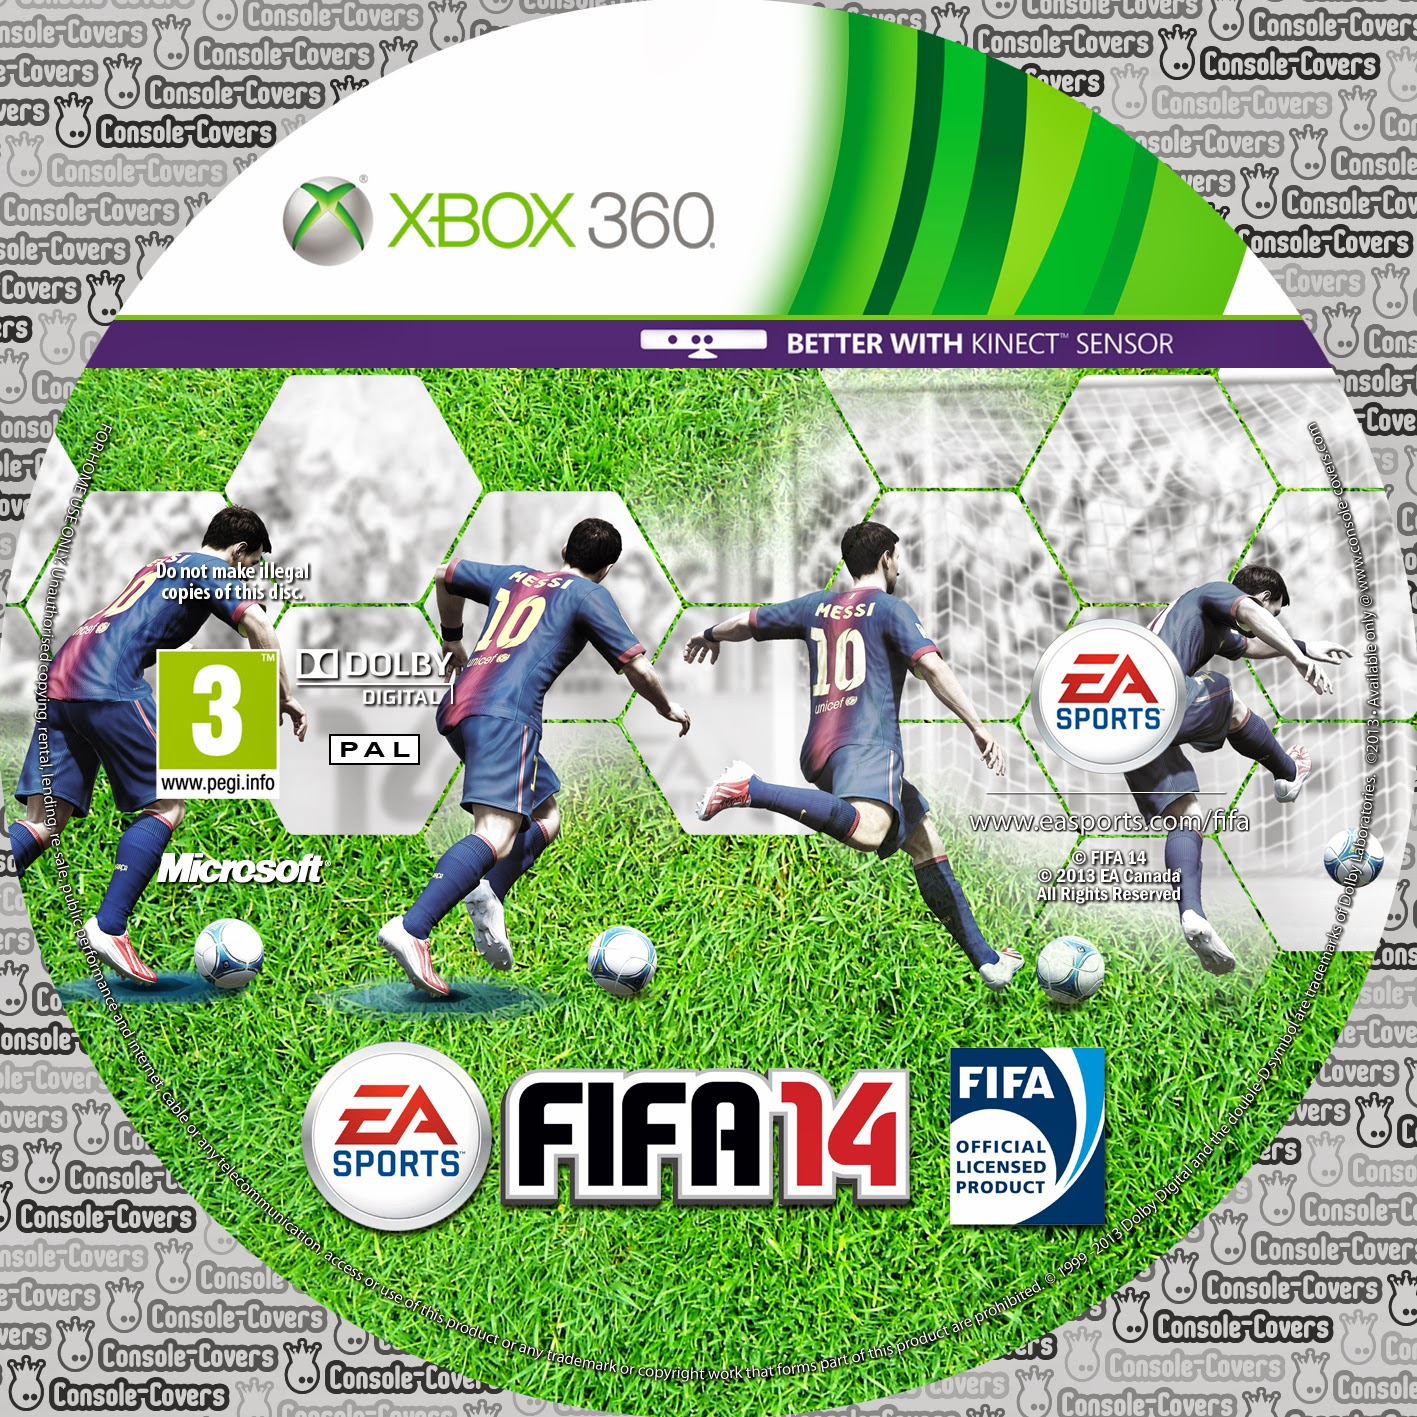 http://1.bp.blogspot.com/-3eUIyndfzmk/UjtufGU8pXI/AAAAAAAA2VI/Ct-nvYiuzbk/s1600/FIFA+14+PAL.jpg